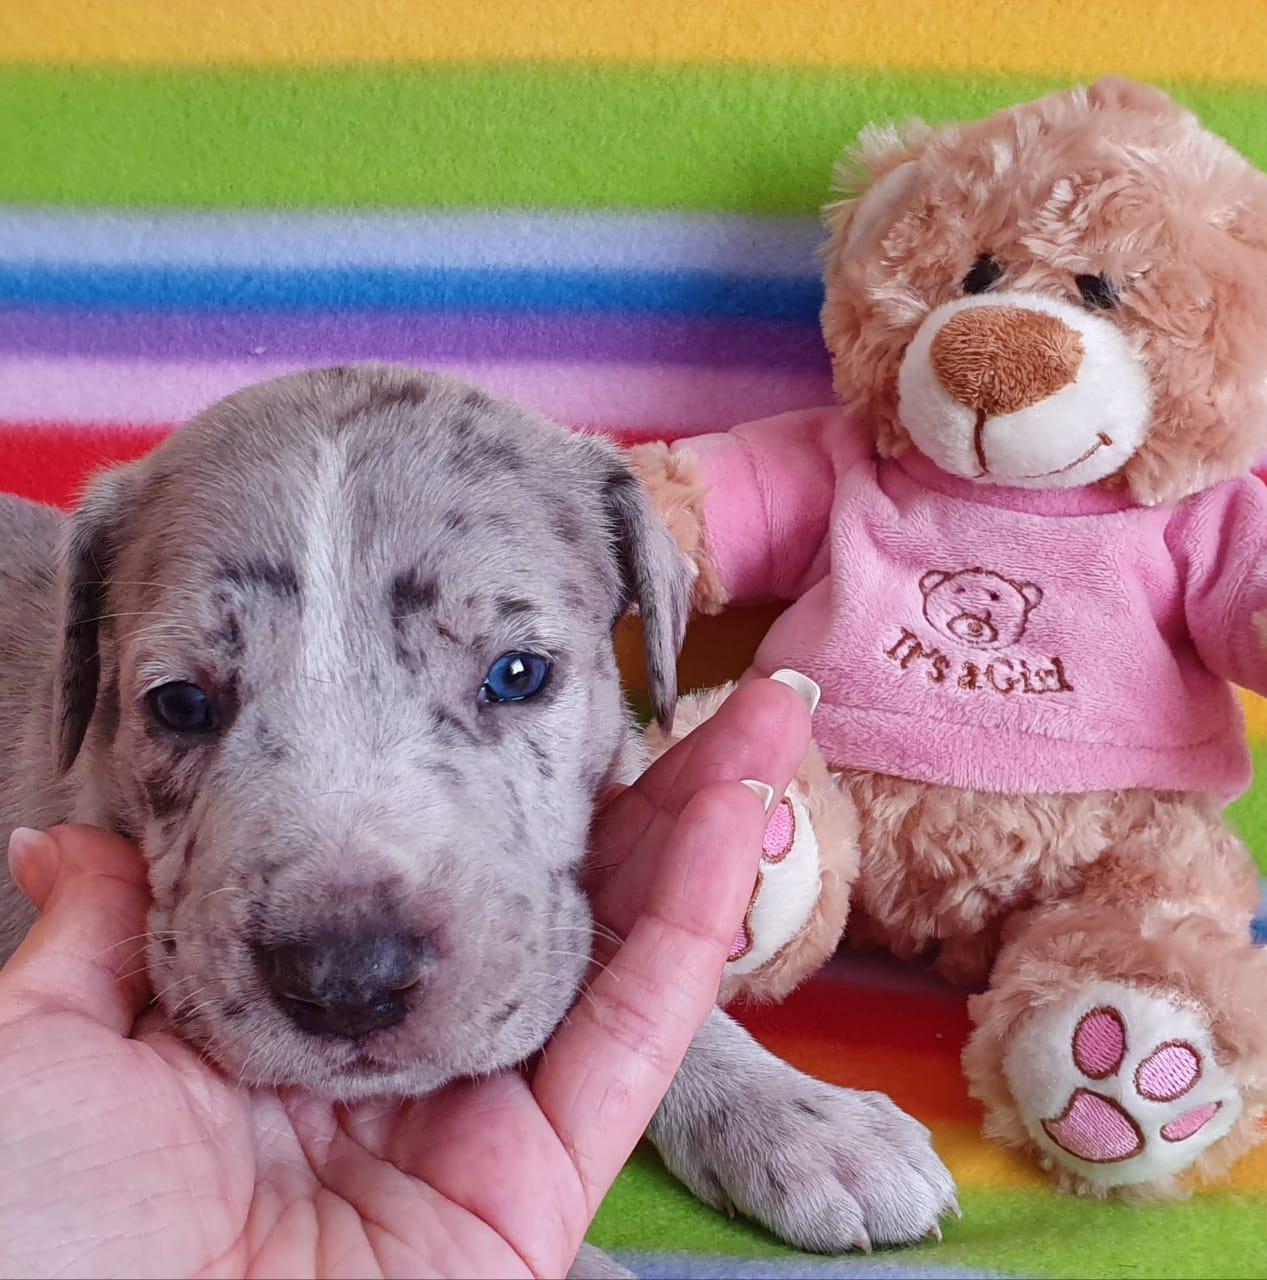 Neodaniff puppies( Greatdane X Neopolitan mastiff) born 28 October 2019